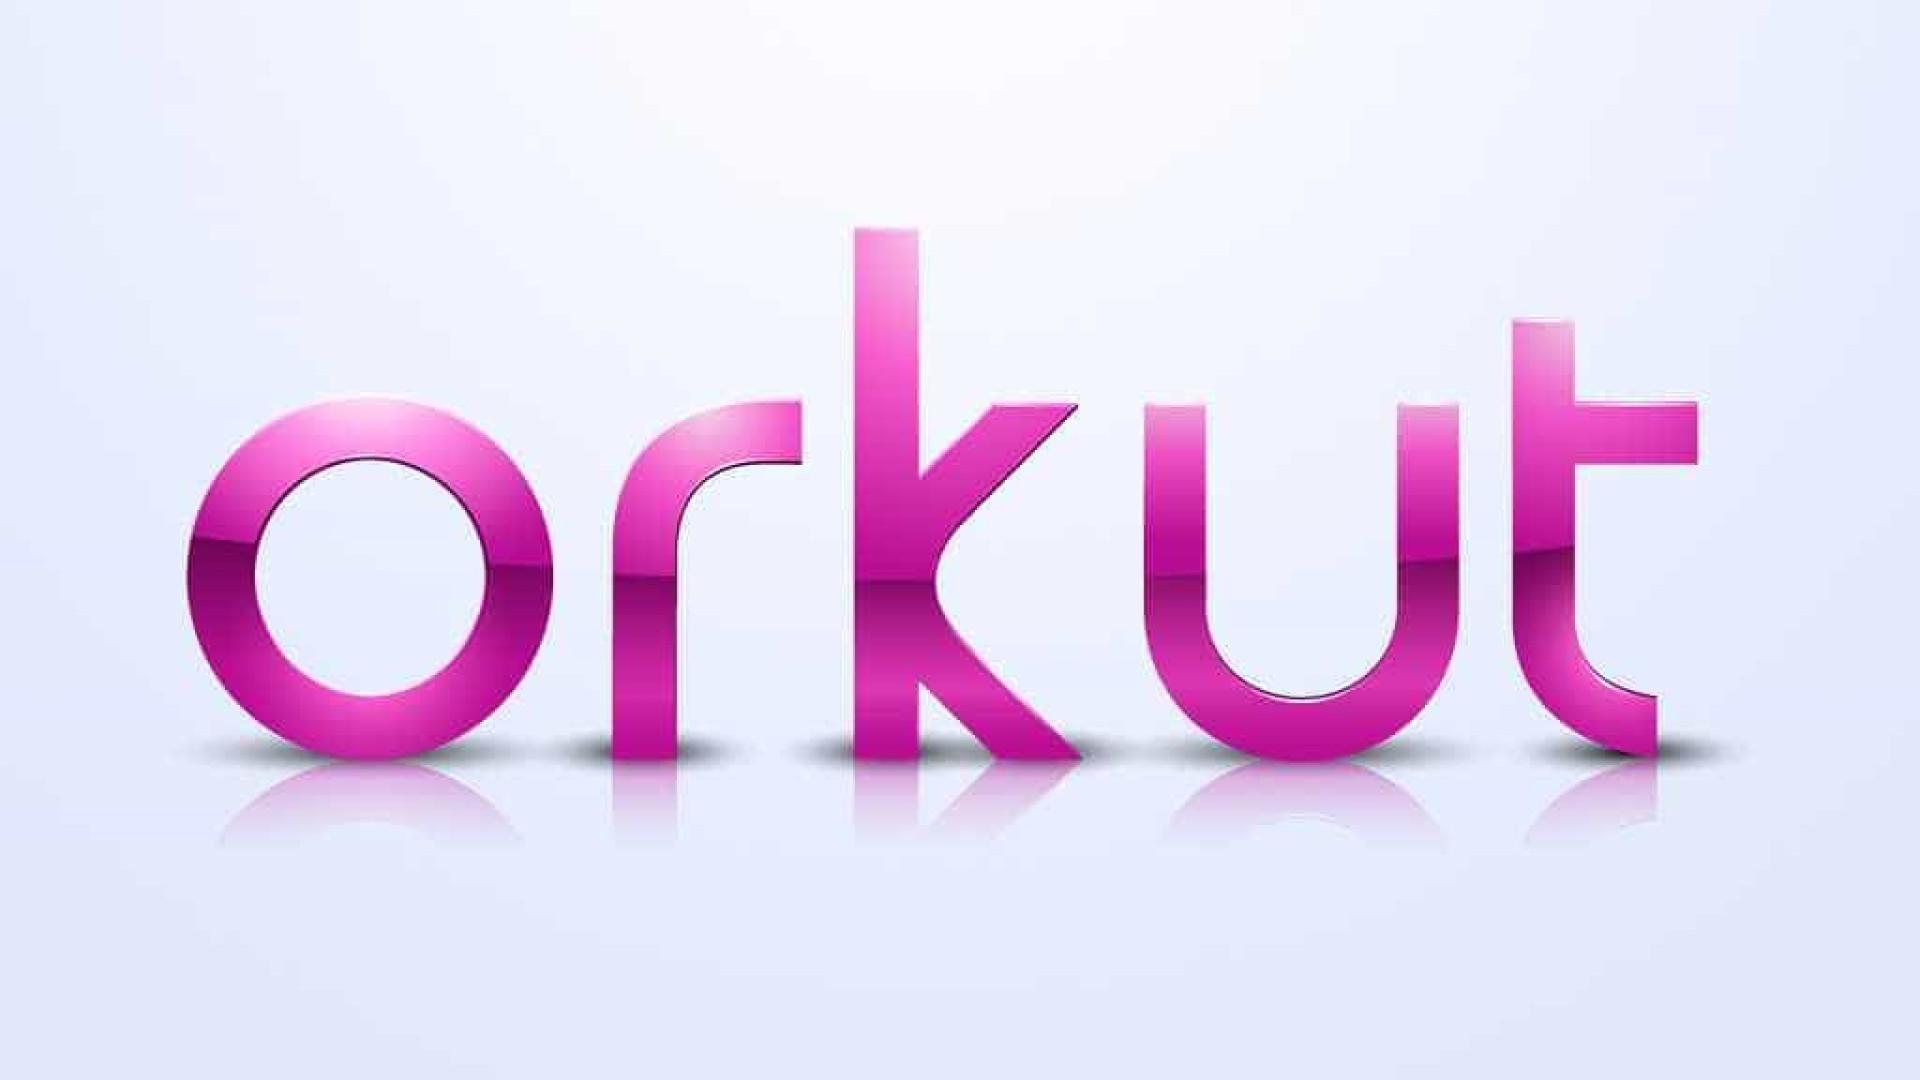 Baixar fotos do orkut